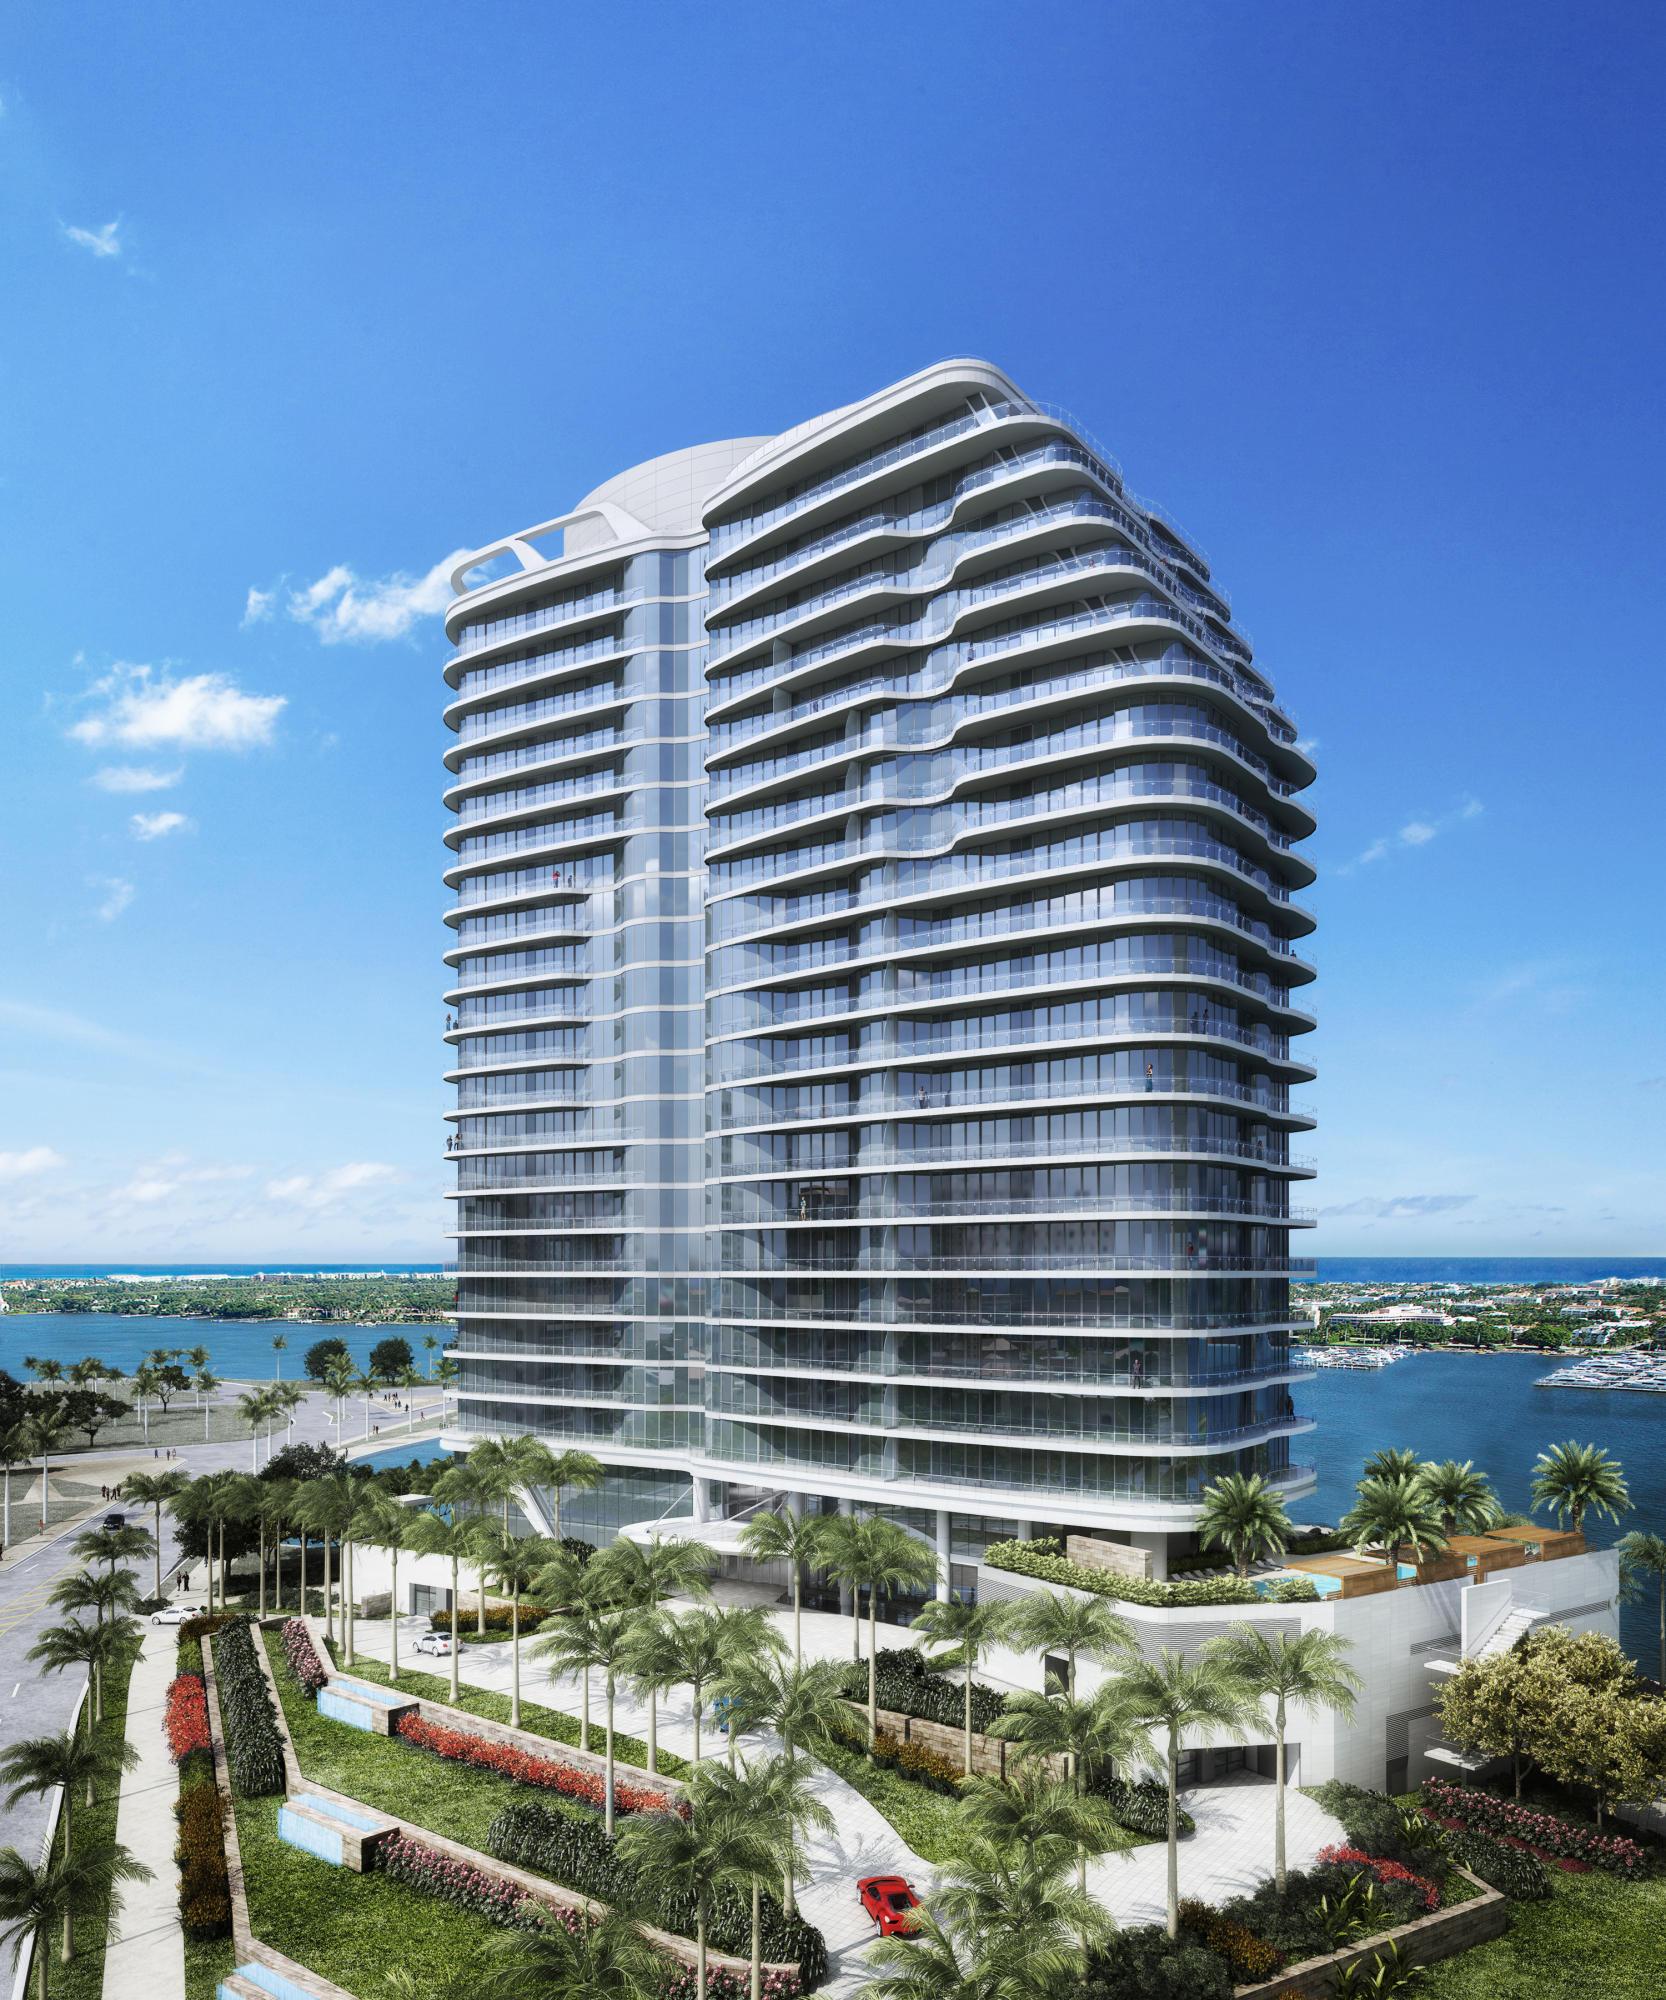 1100 Flagler Drive, West Palm Beach, Florida 33401, 4 Bedrooms Bedrooms, ,4.1 BathroomsBathrooms,Condo/Coop,For Rent,Flagler,11,RX-10542139